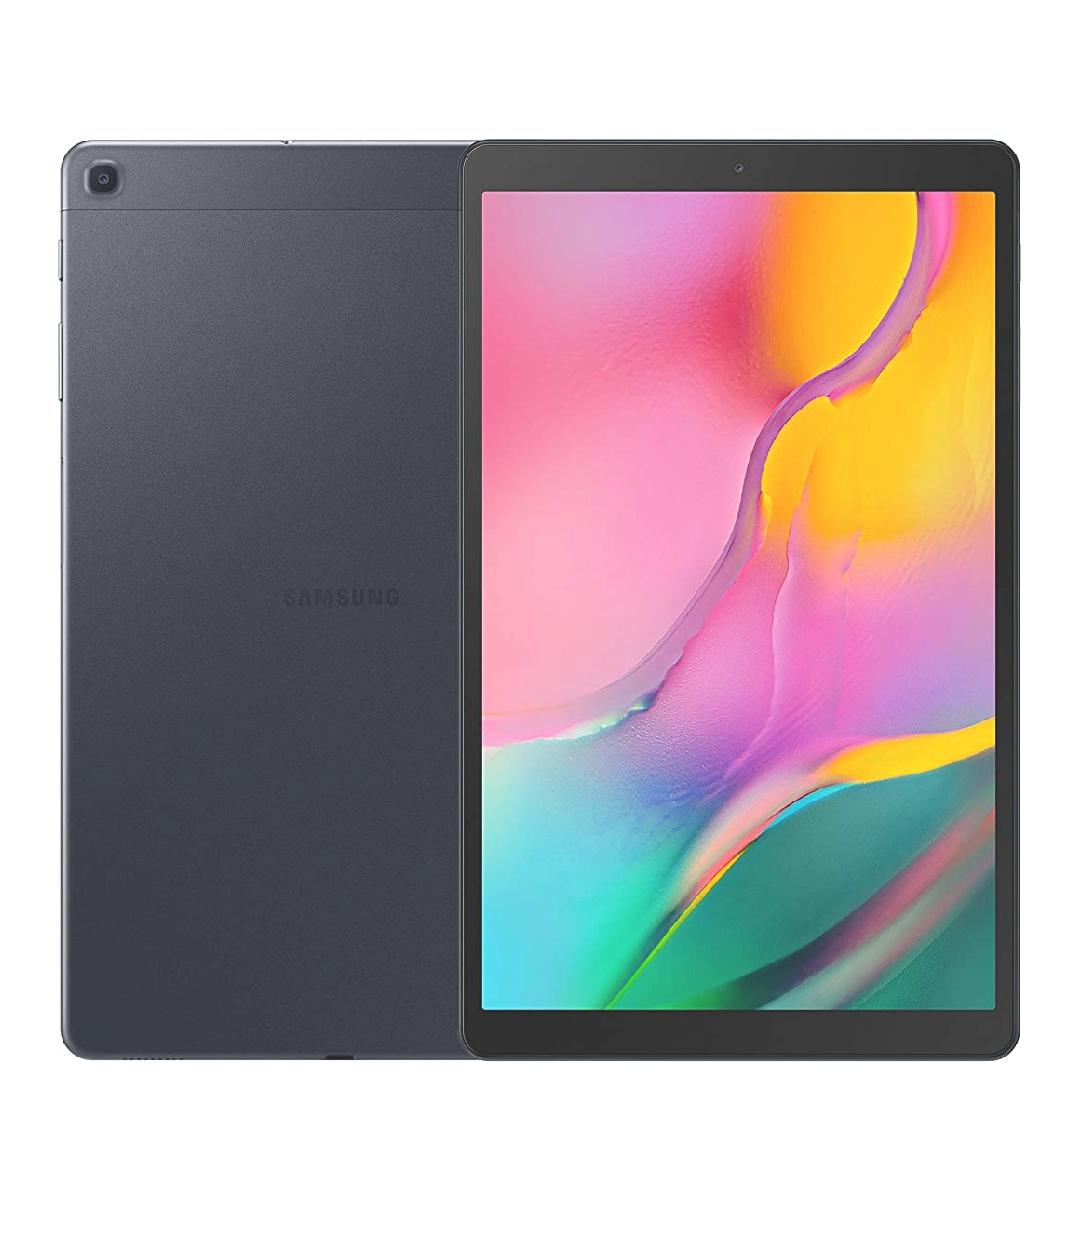 "Samsung Galaxy Tab A - Tablet de 10.1"" Full HD 3 GB RAM / 64 GB, Negro"